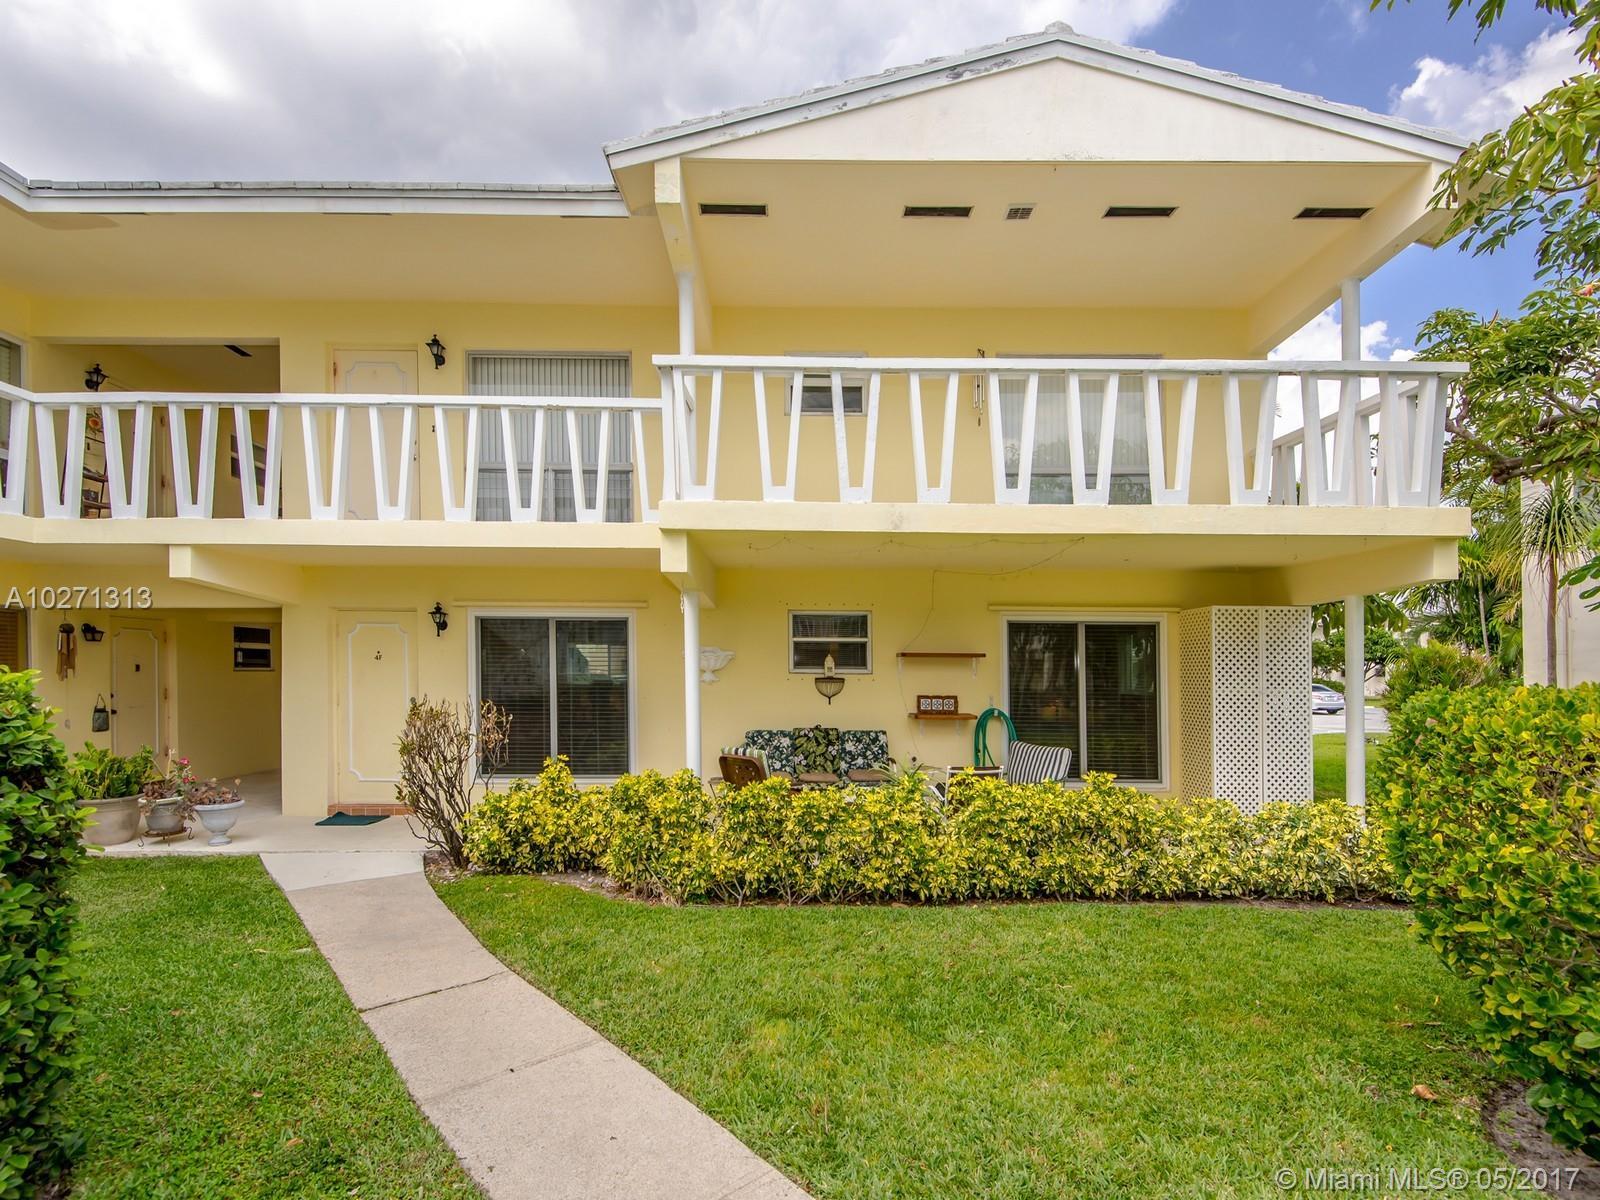 2755 NE 28th Ave, F4 - Lighthouse Point, Florida